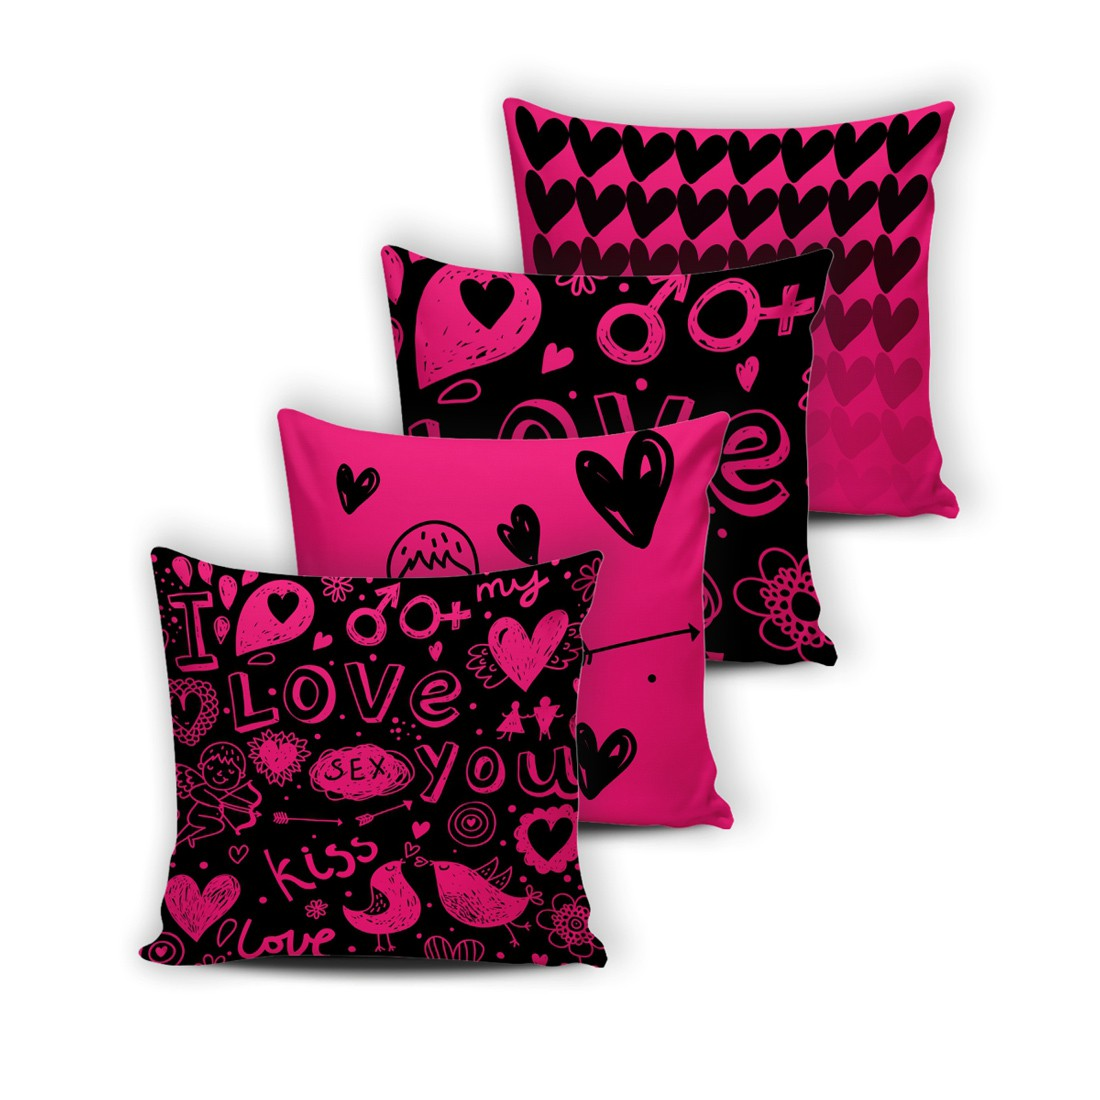 Kit Capas de Almofadas Innovative Love Pink 04 Peças